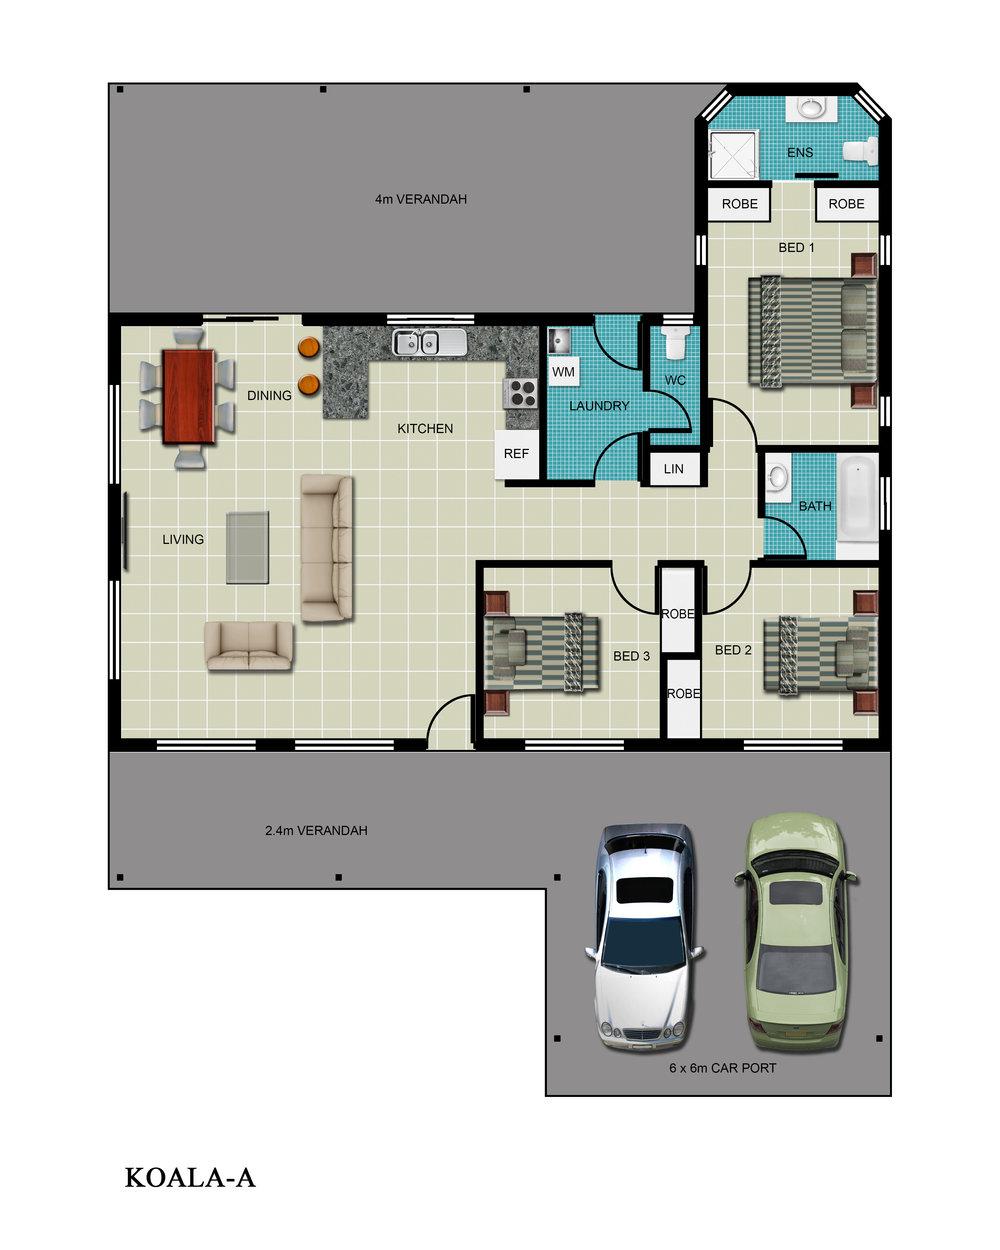 Koala-A Floor Plan